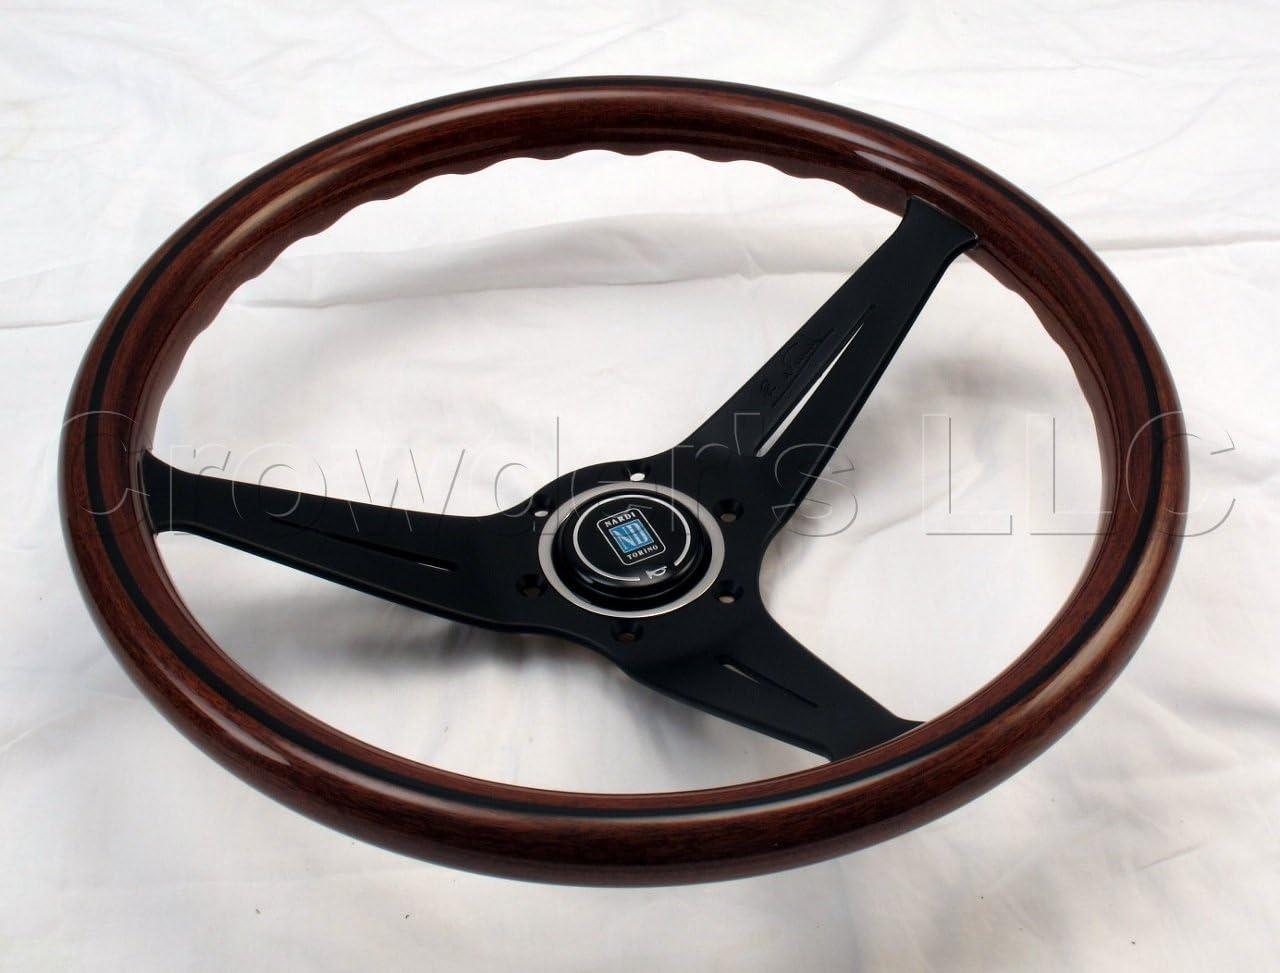 NARDI Steering Wheel Deep Dish Corn 350 mm Mahogany Wood with Black Spokes Classic Horn Button